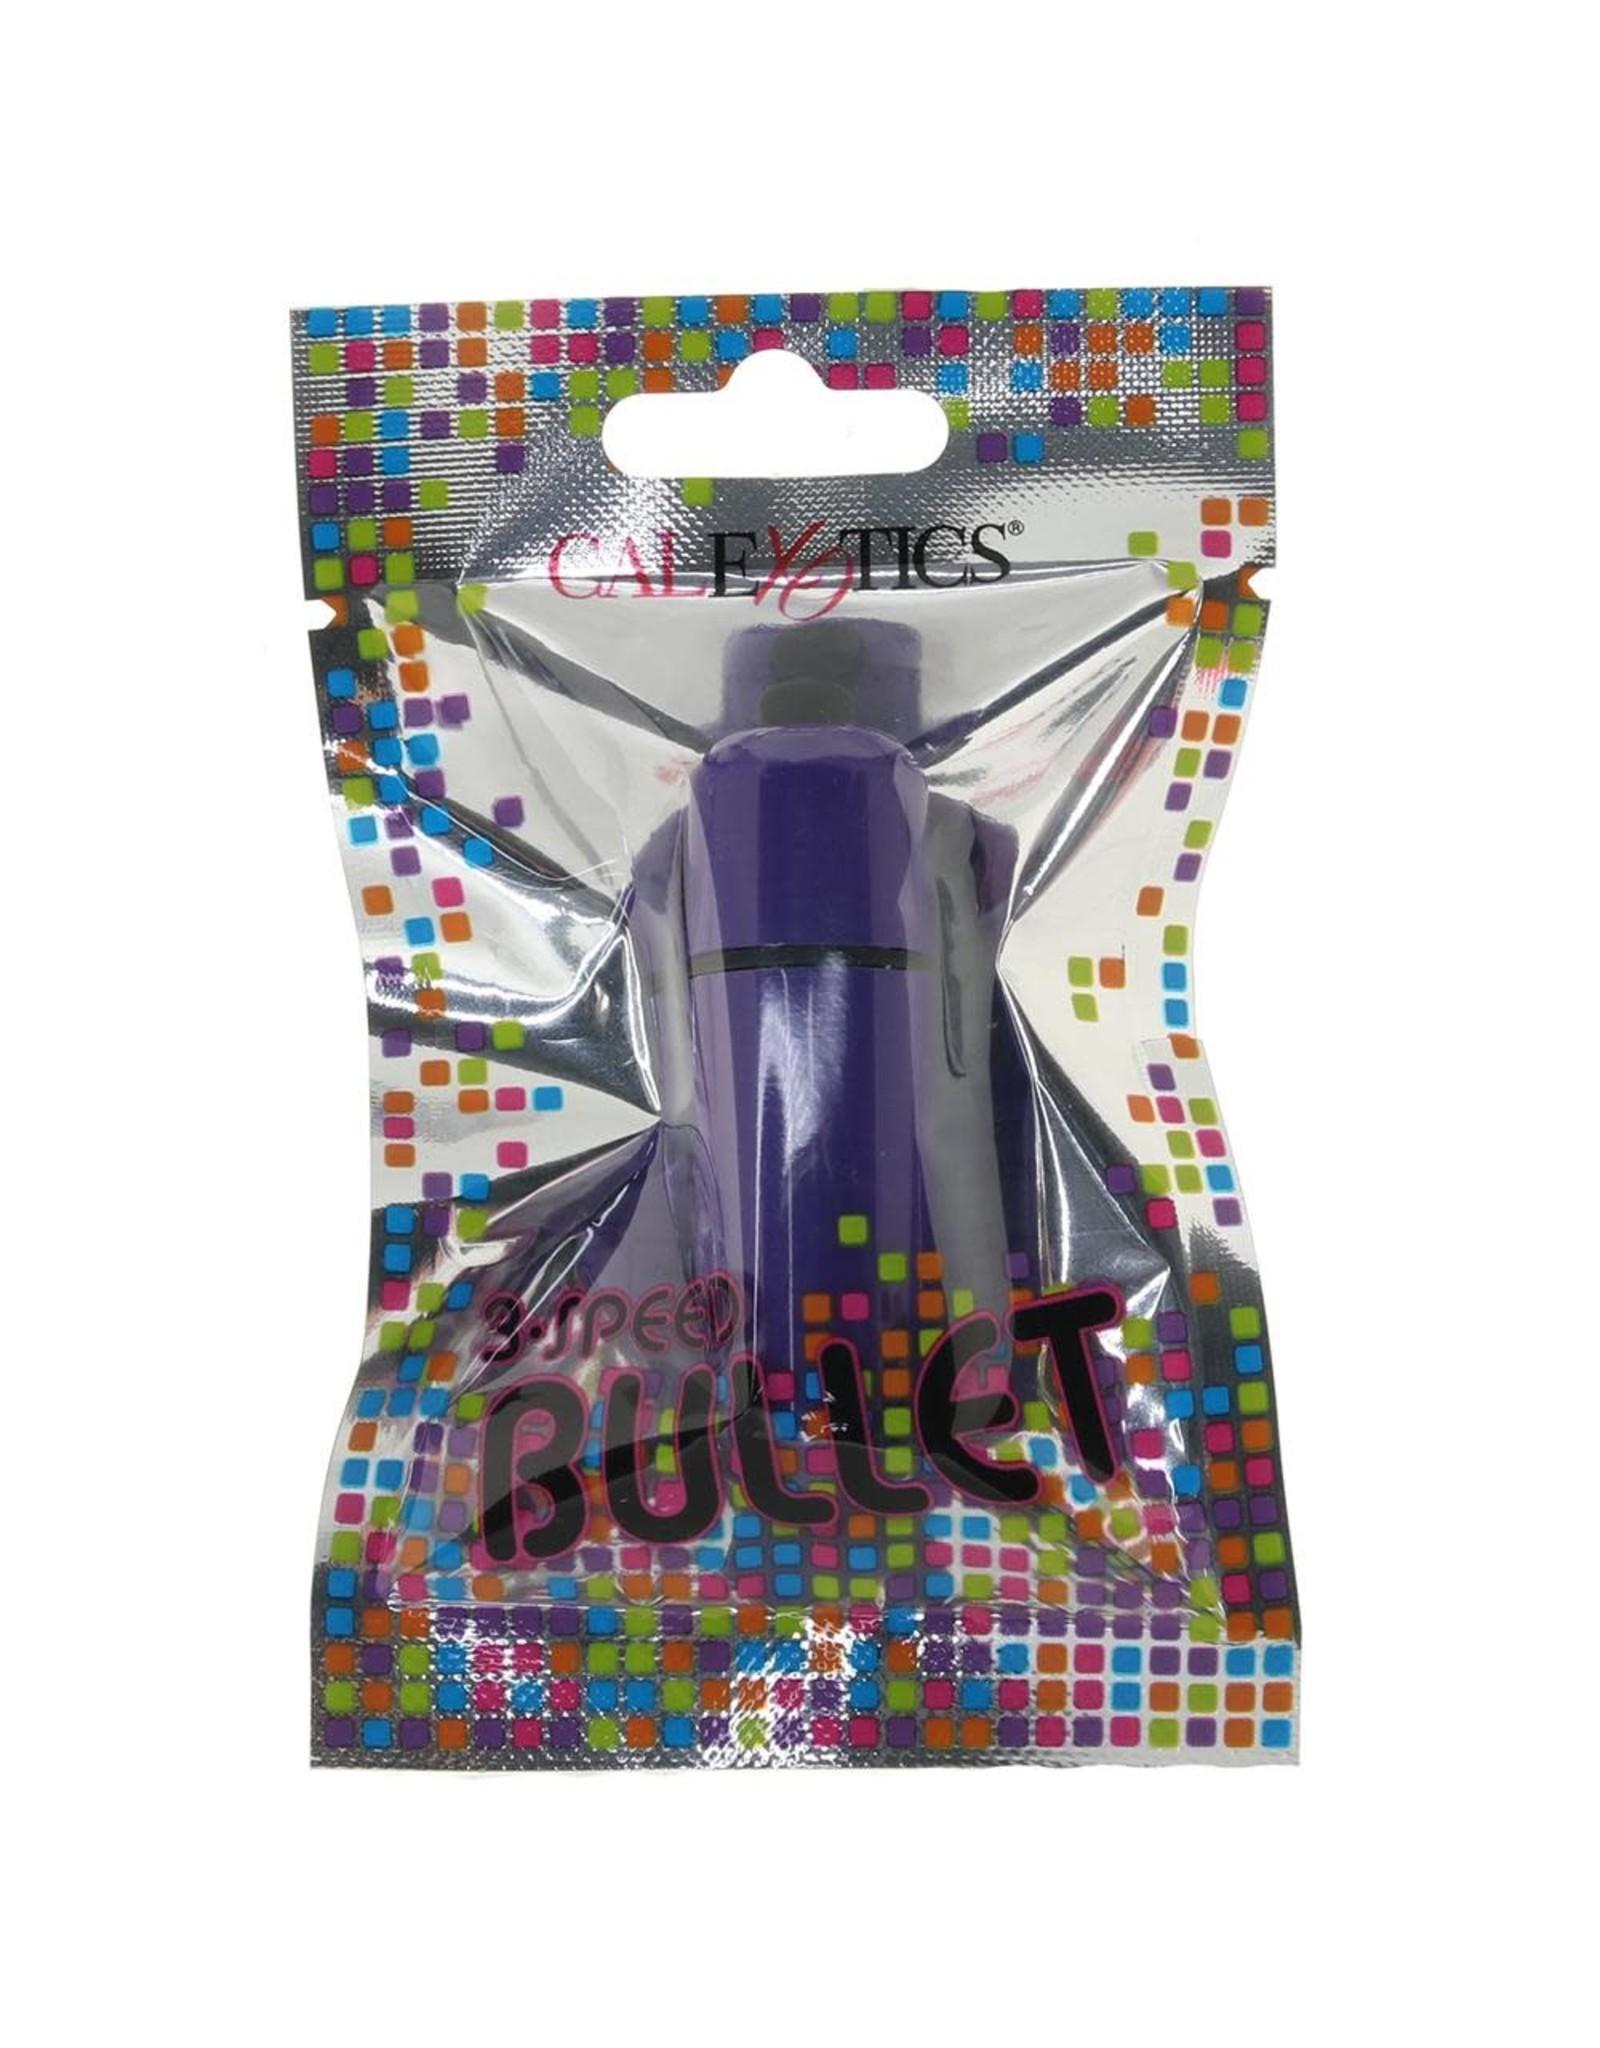 CALEXOTICS CALEXOTICS - FOIL PACK 3-SPEED BULLET - PURPLE